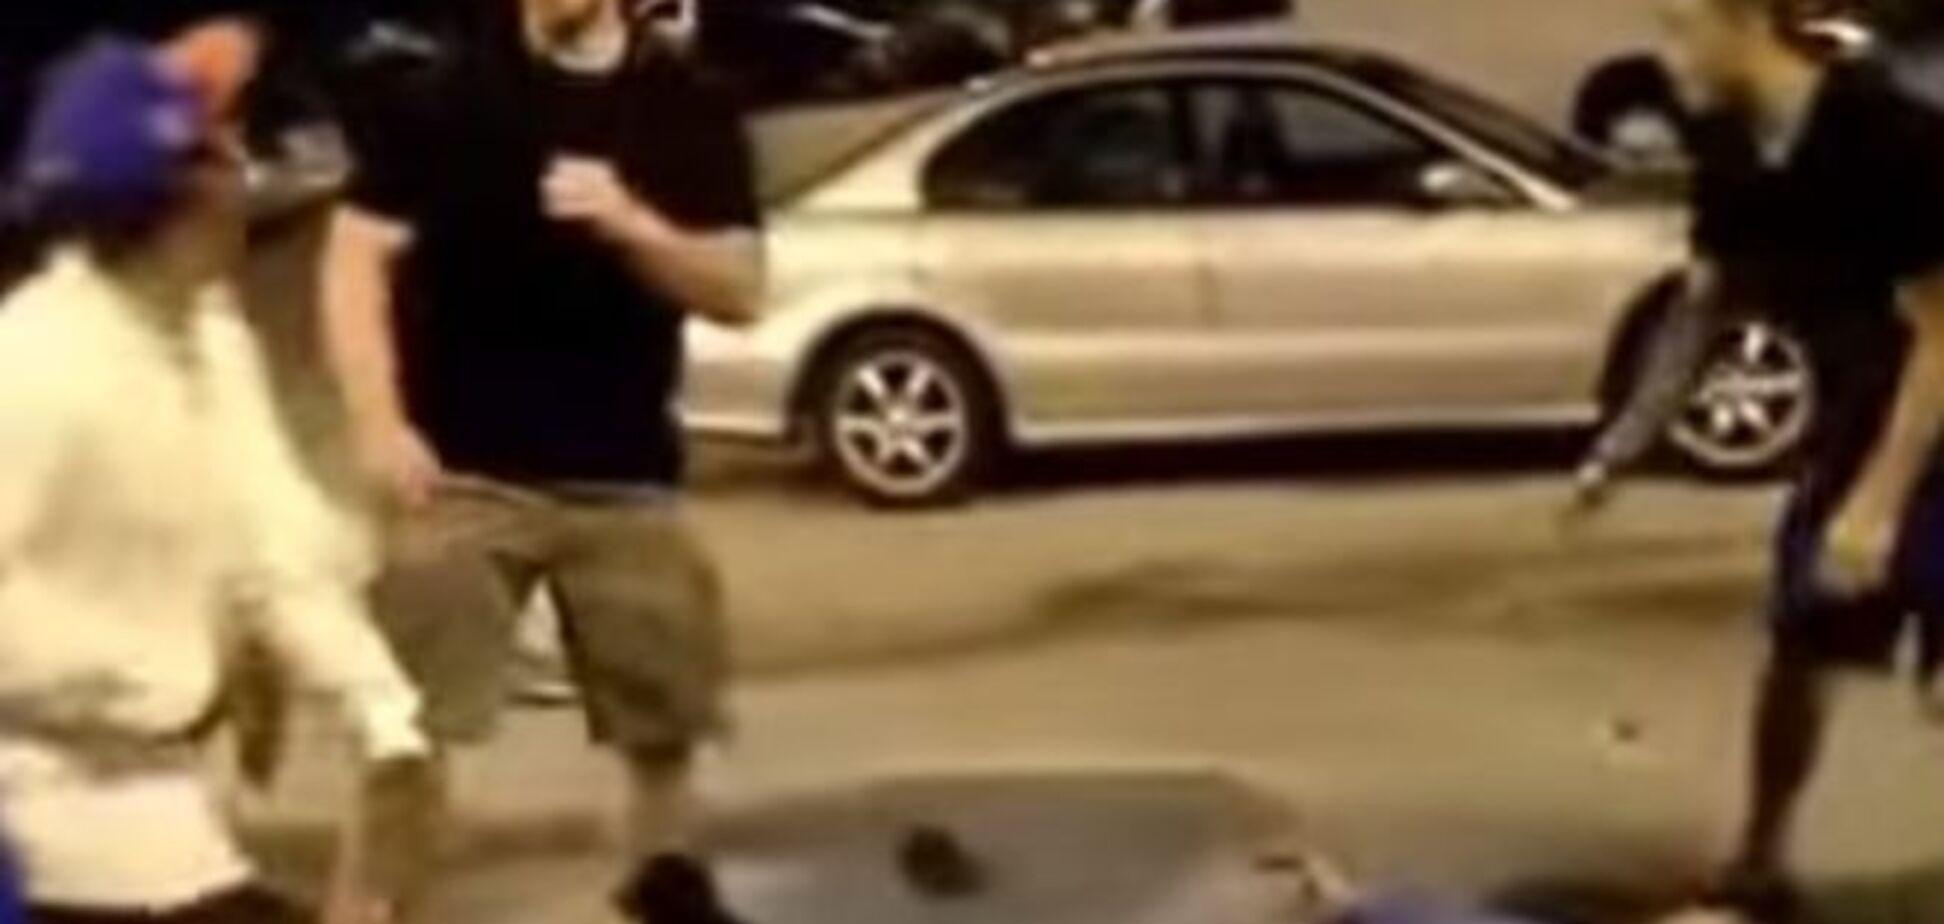 'Одесский боксер' взорвал Youtube, нокаутировав троих за 7 секунд: жесткое видео